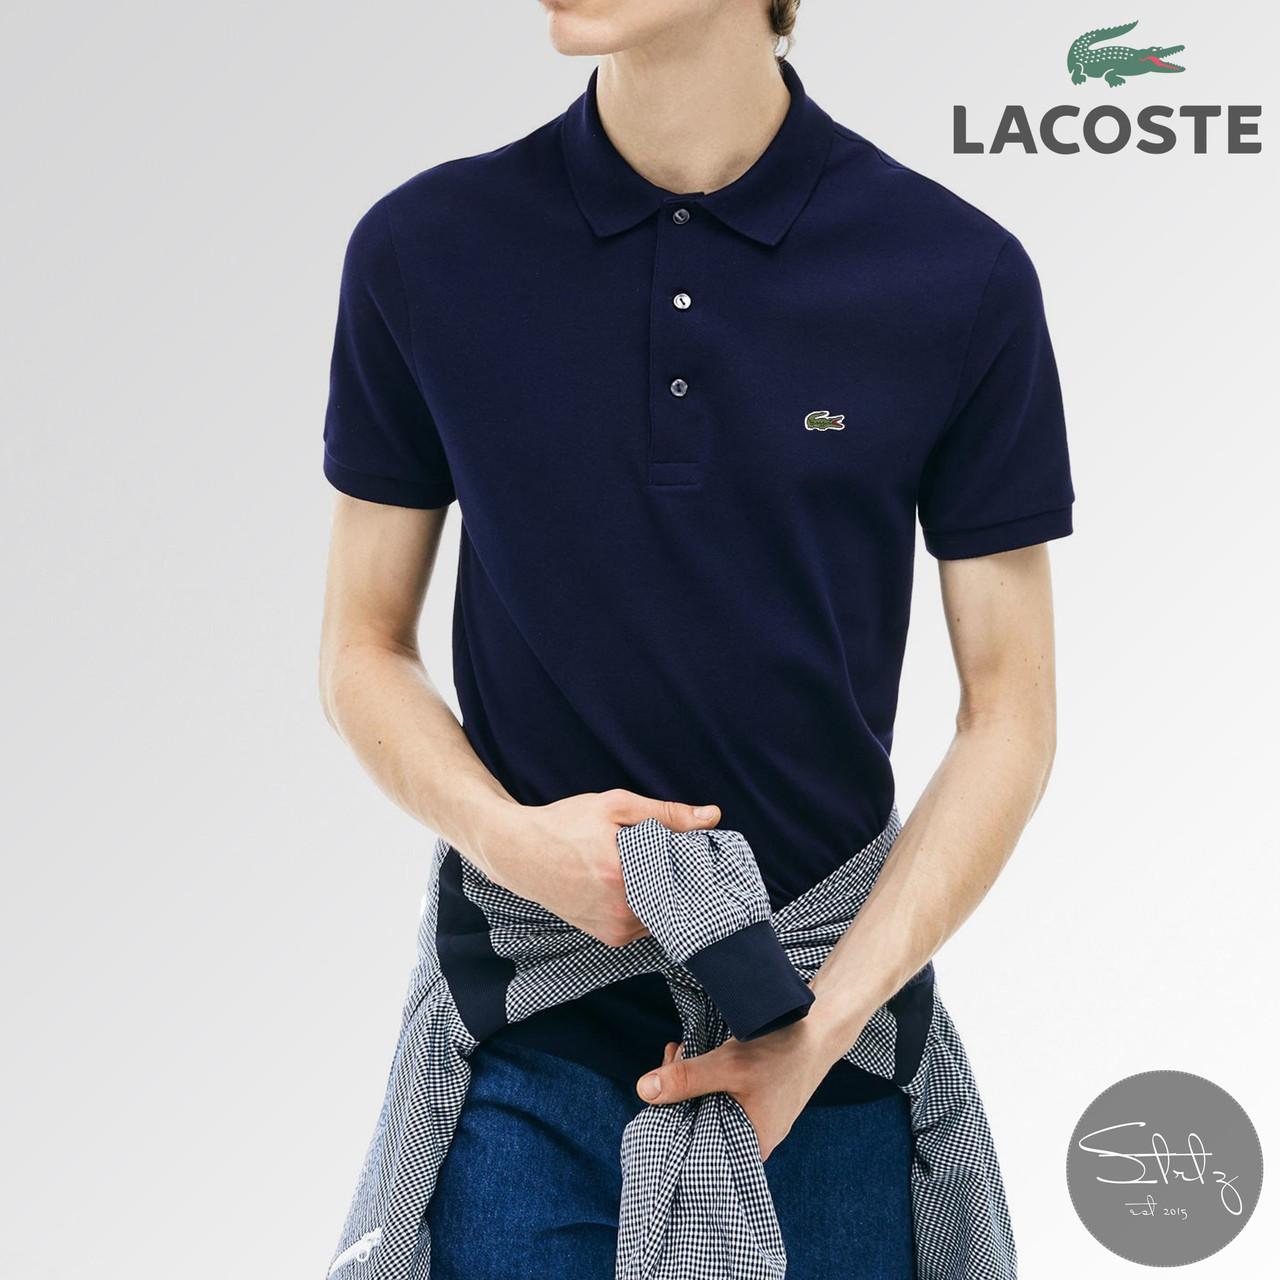 Мужская футболка поло Lacoste (dark blue), темно-синие мужское поло Лакосте